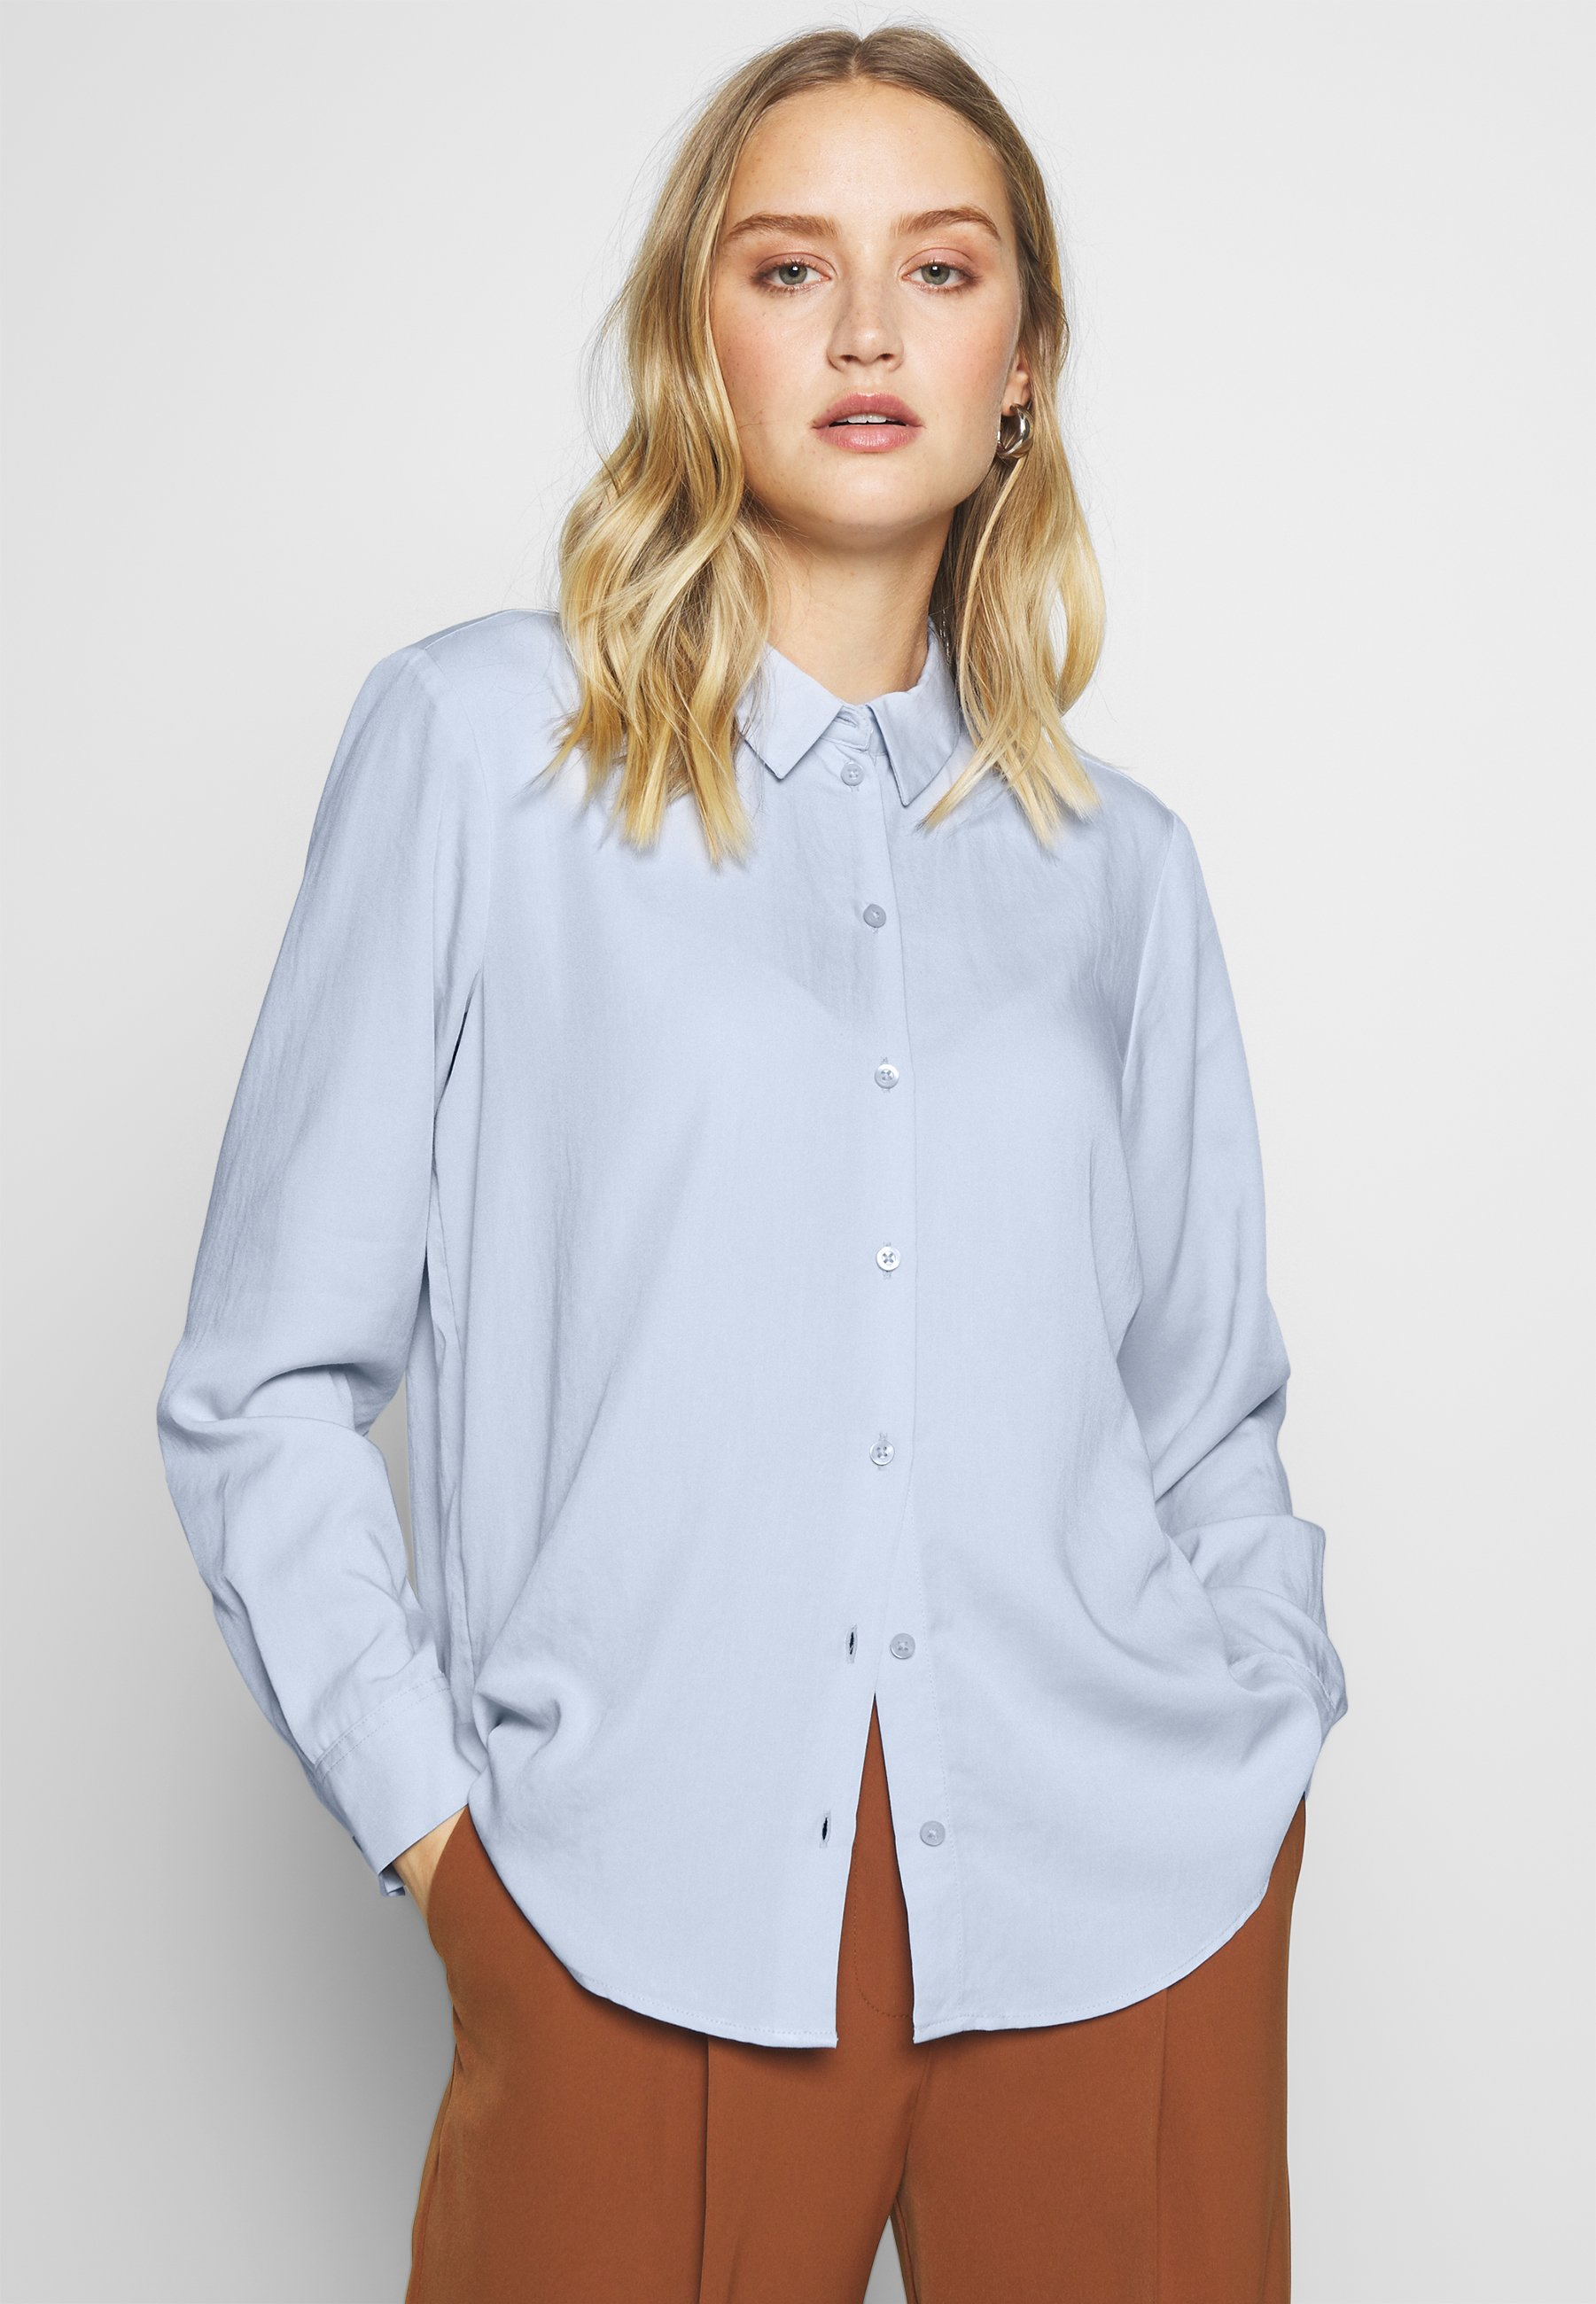 Women BLOUSE - Button-down blouse - soft charming blue